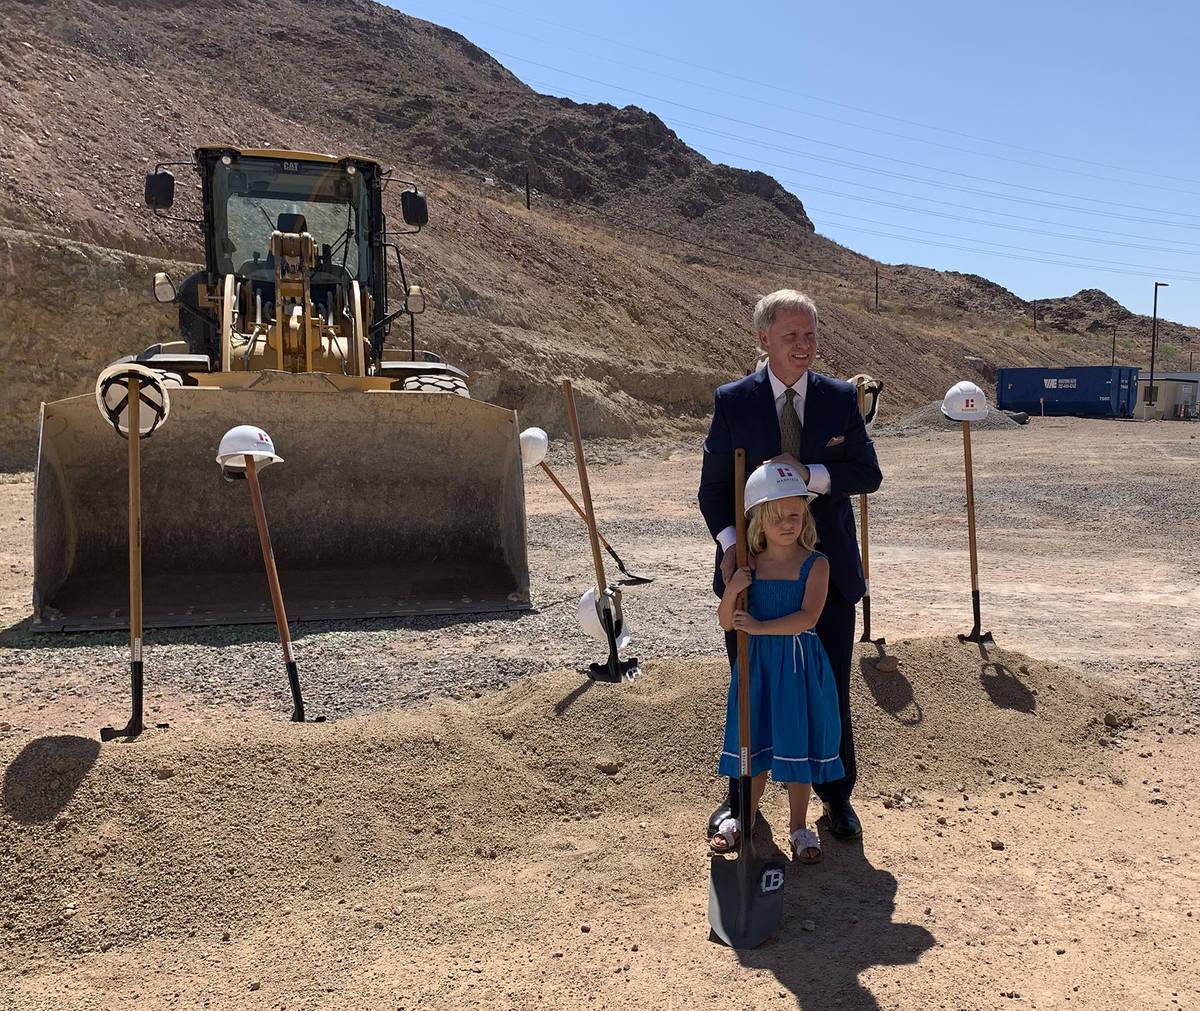 (Hali Bernstein Saylor/Boulder City Review) Joe DeSimone, owner of the Railroad Pass, poses for ...